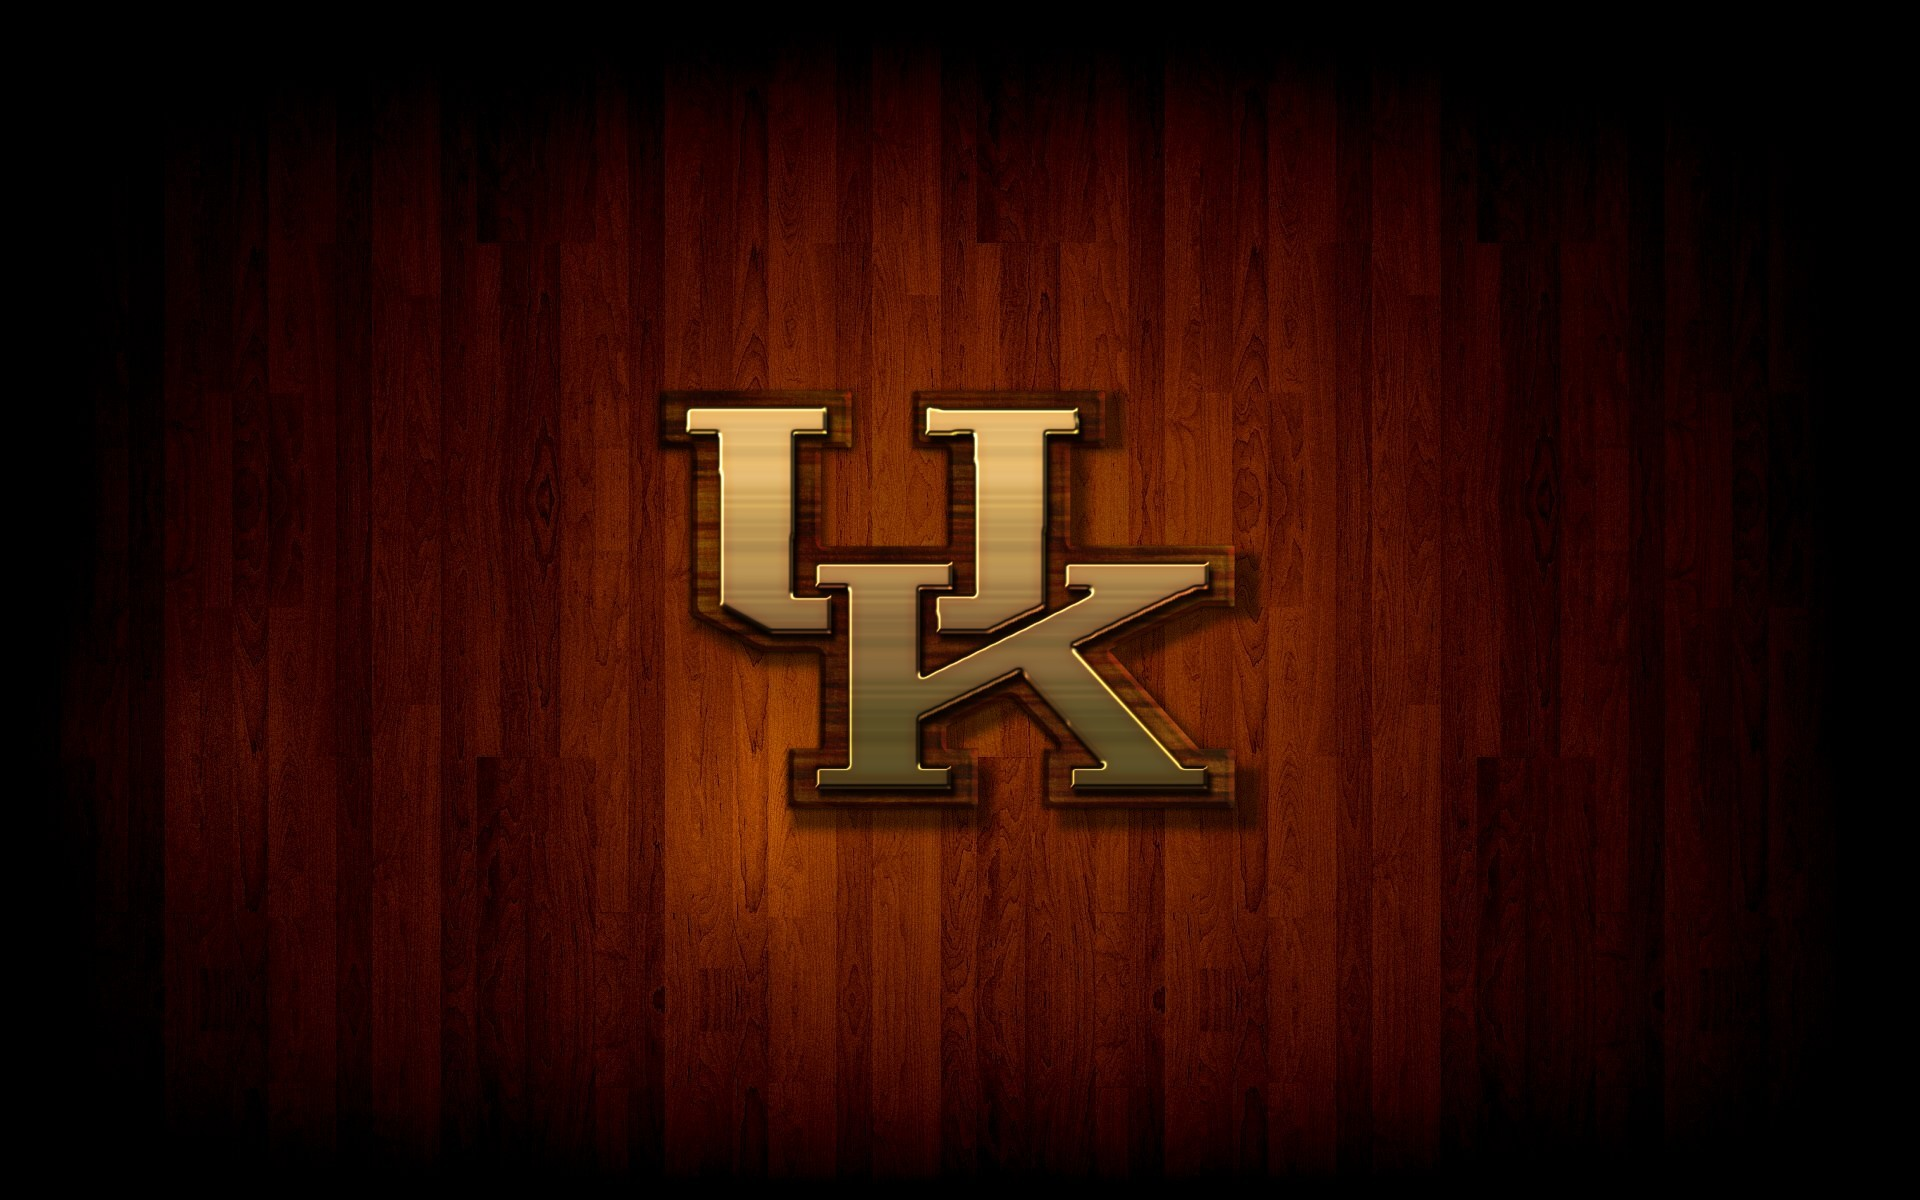 University Of Kentucky Basketball Wallpapers Group | HD Wallpapers |  Pinterest | Wallpaper and Hd wallpaper